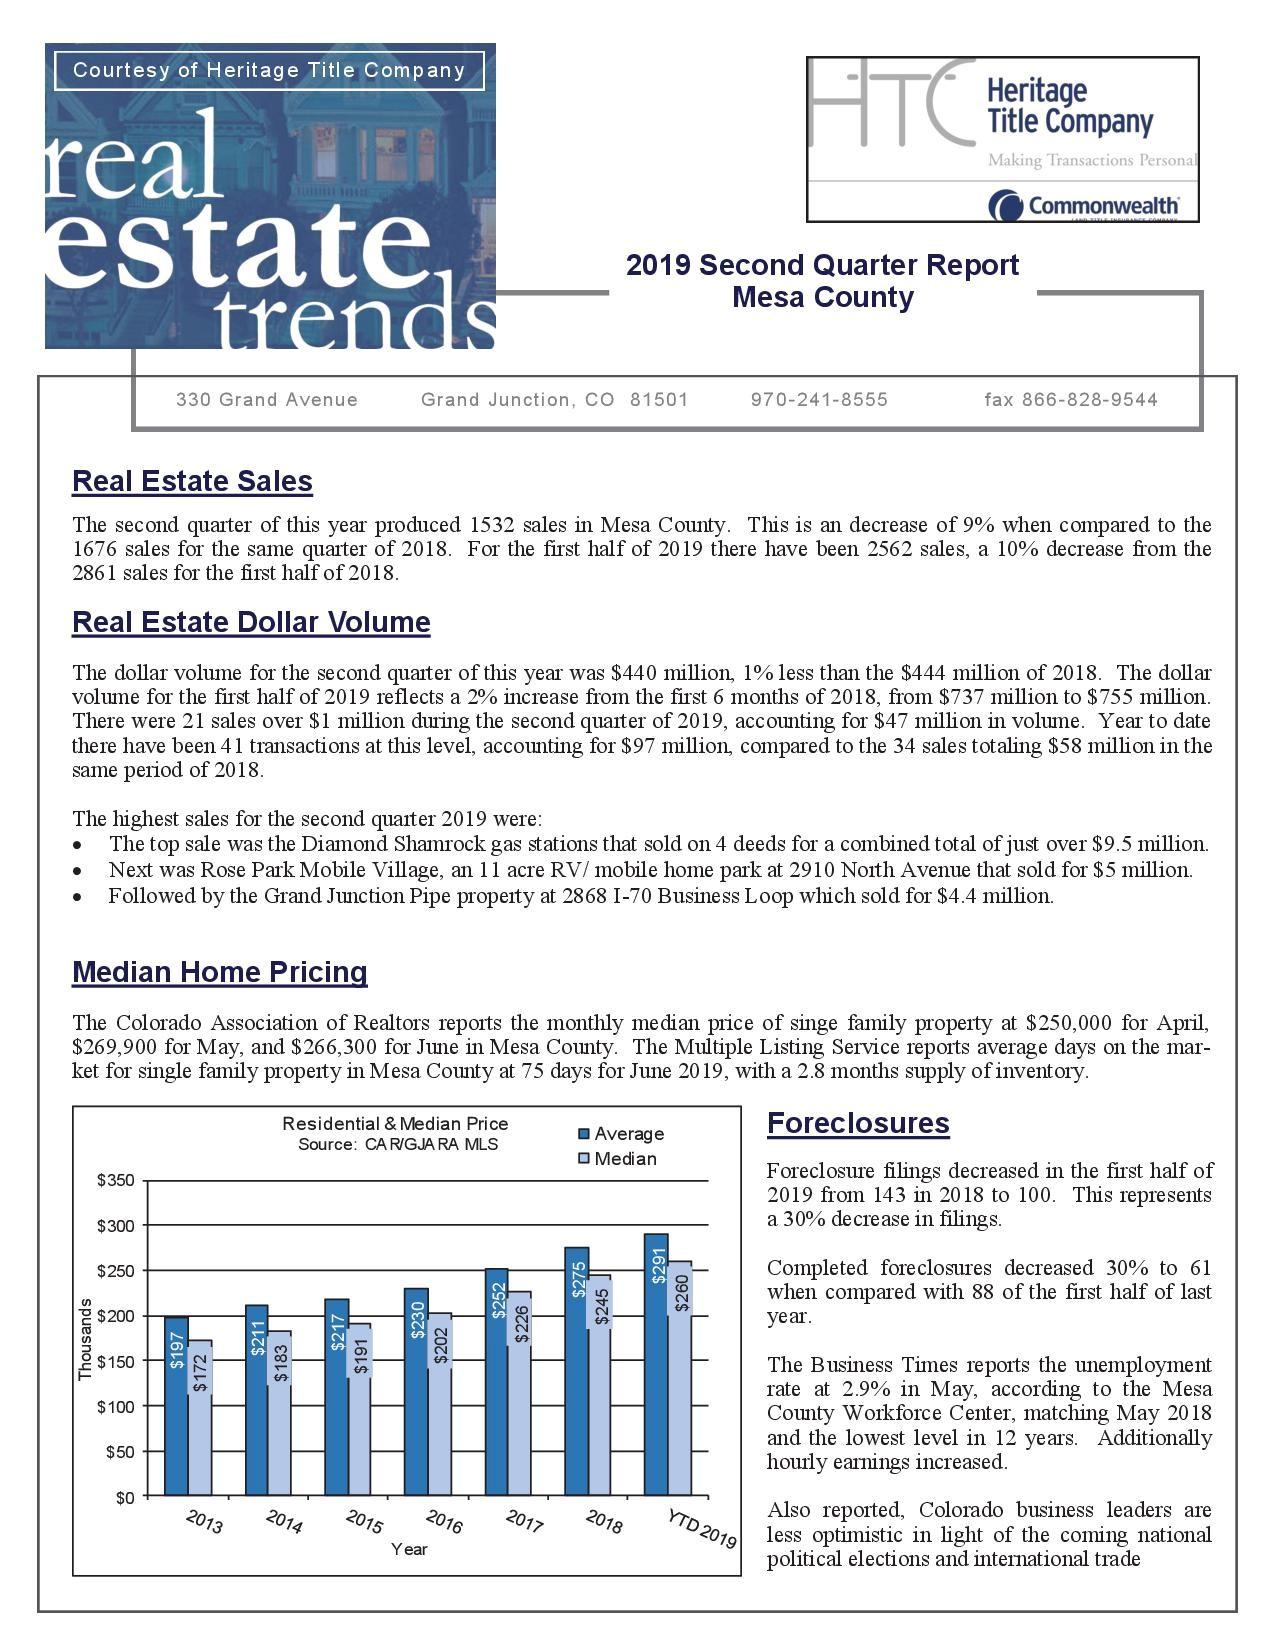 Mesa County Second Quarter Real Estate Trends P.1